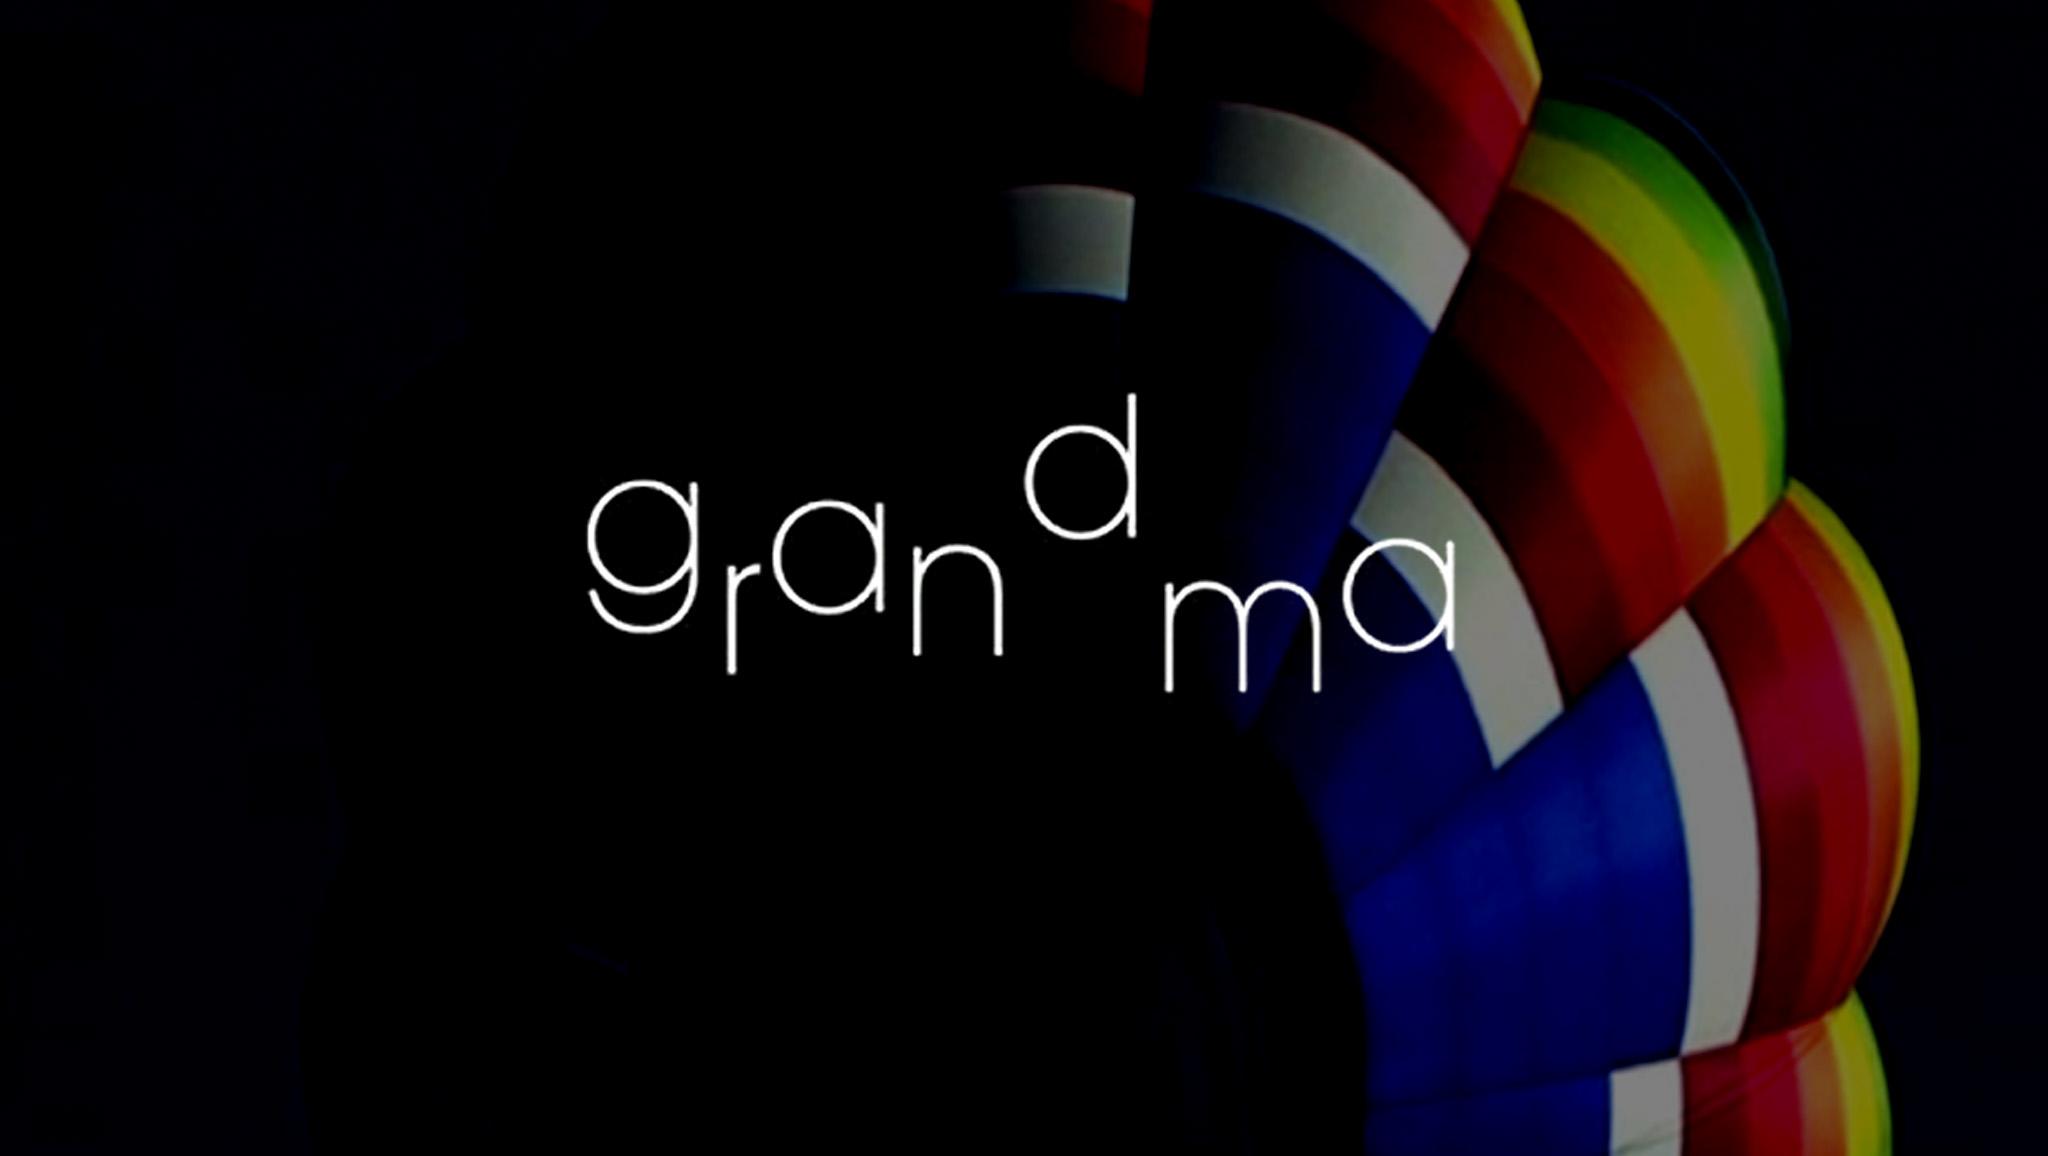 Grandma Main Title Frame